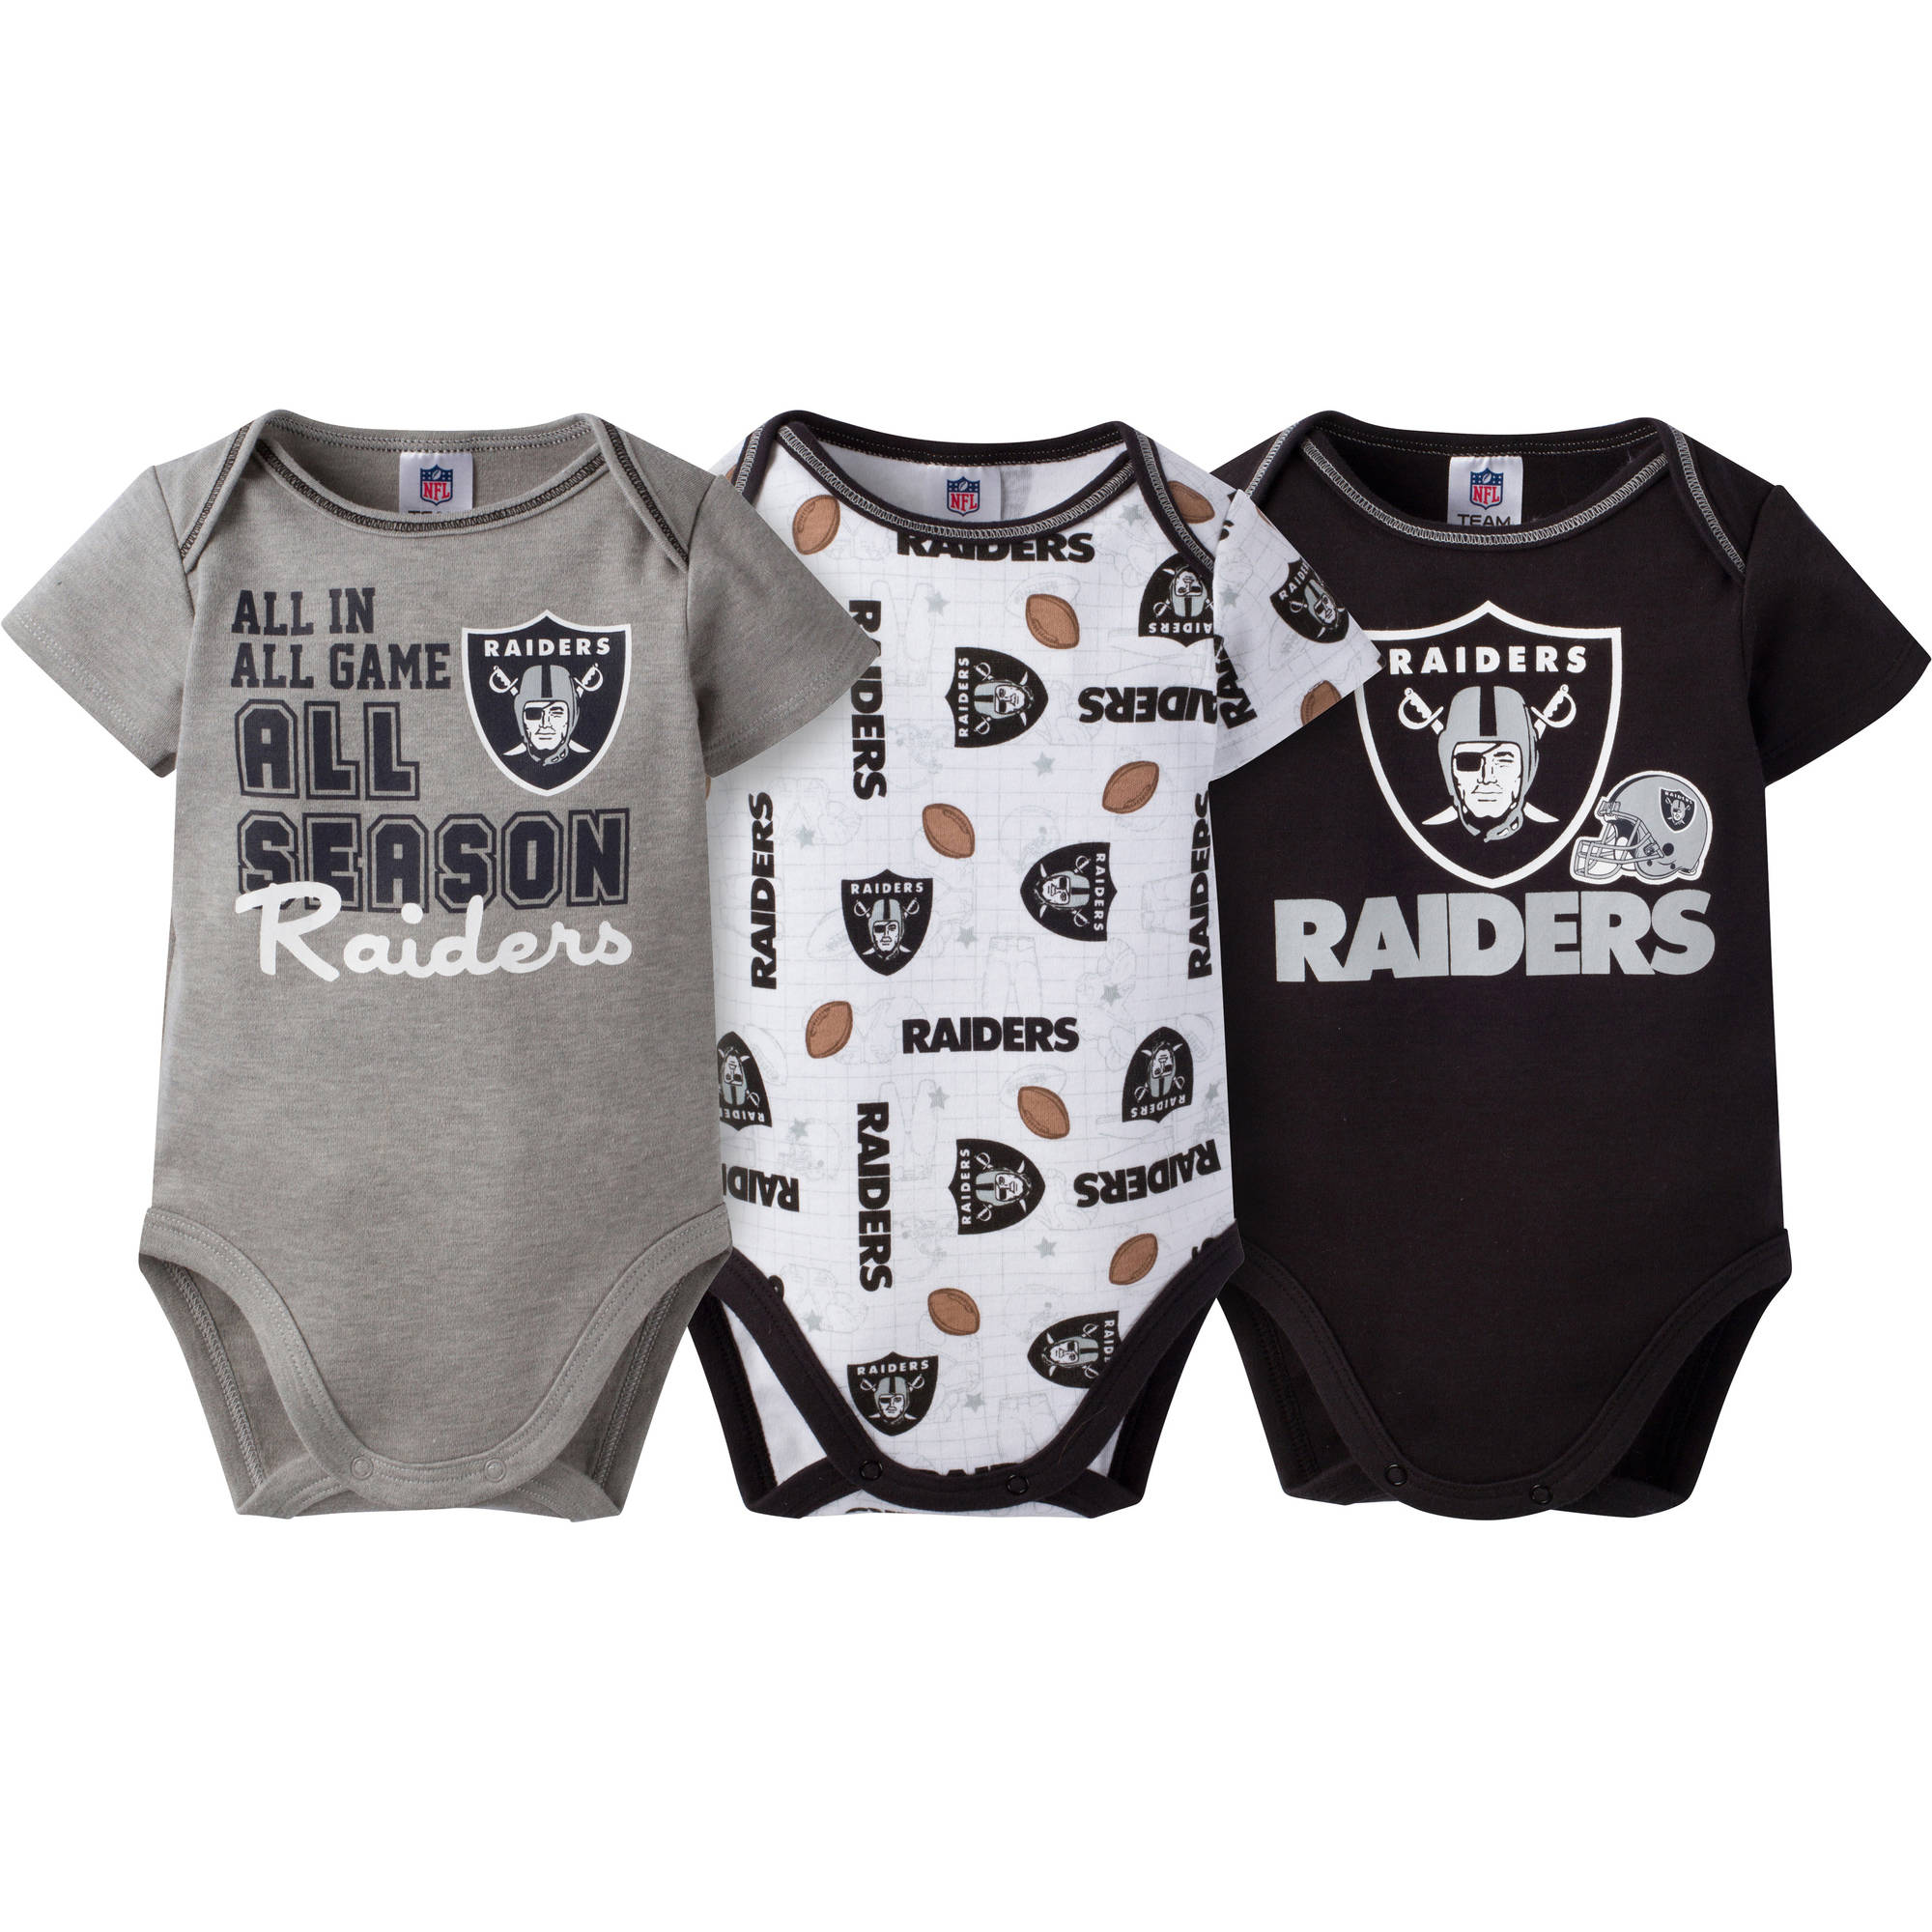 NFL Oakland Raiders Baby Boys Short Sleeve Bodysuit Set, 3-Pack